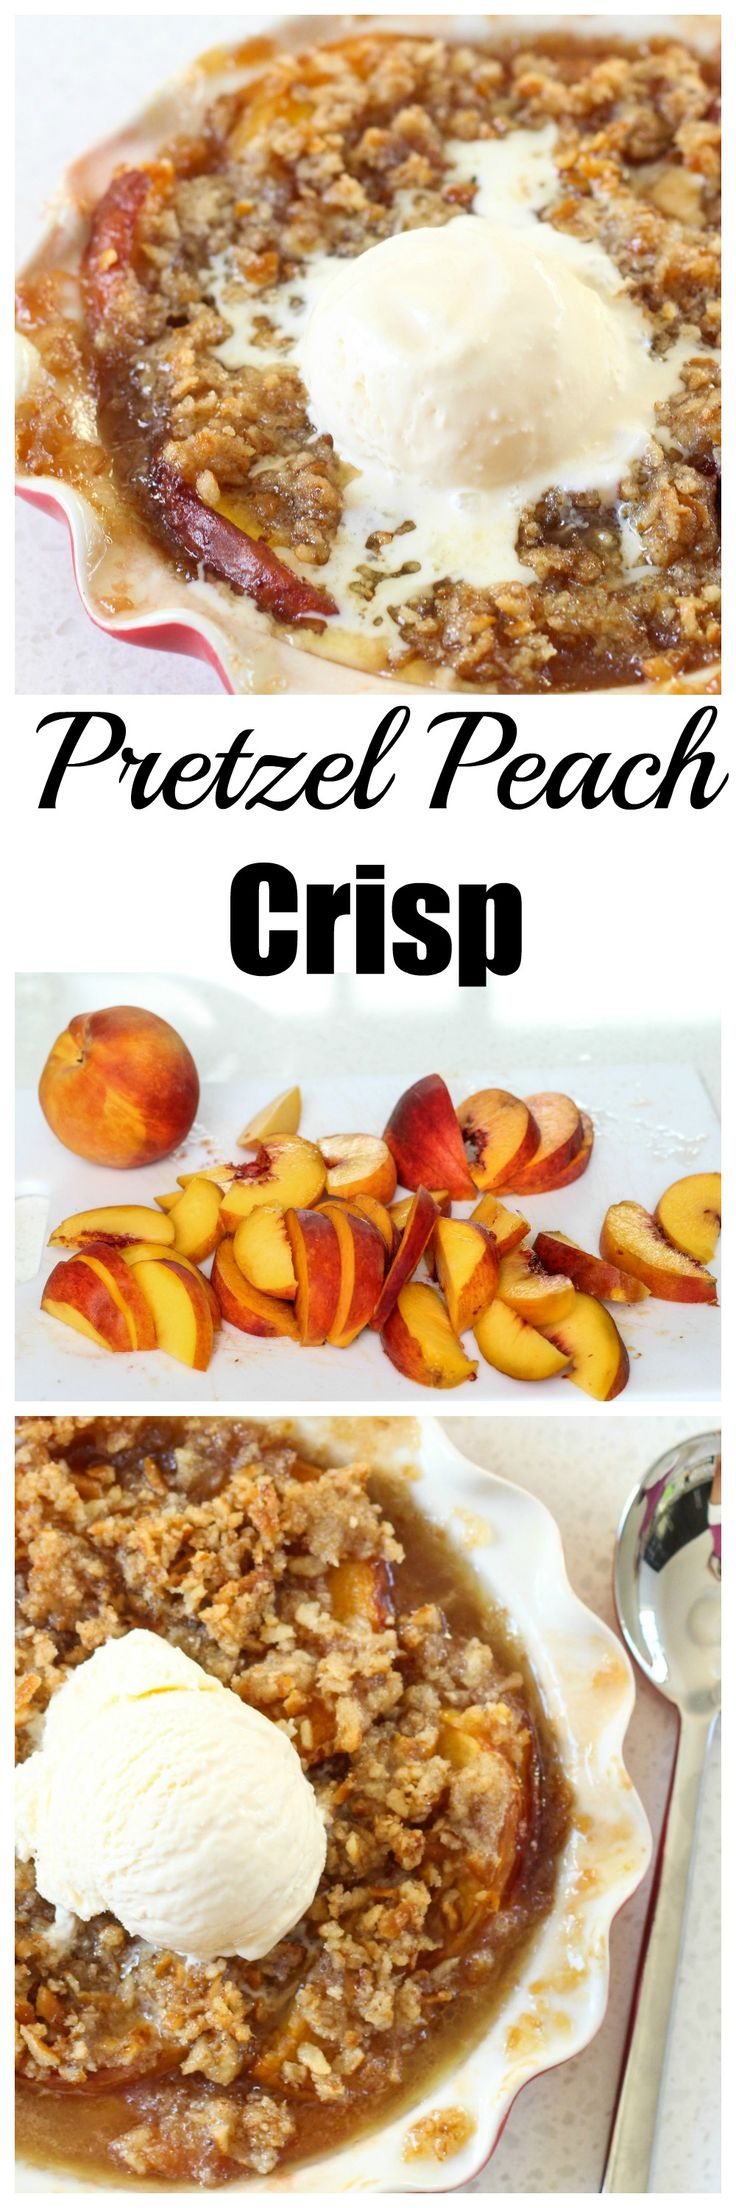 Peach Crisp with a Pretzel Crumble - The perfect salty sweet dessert!